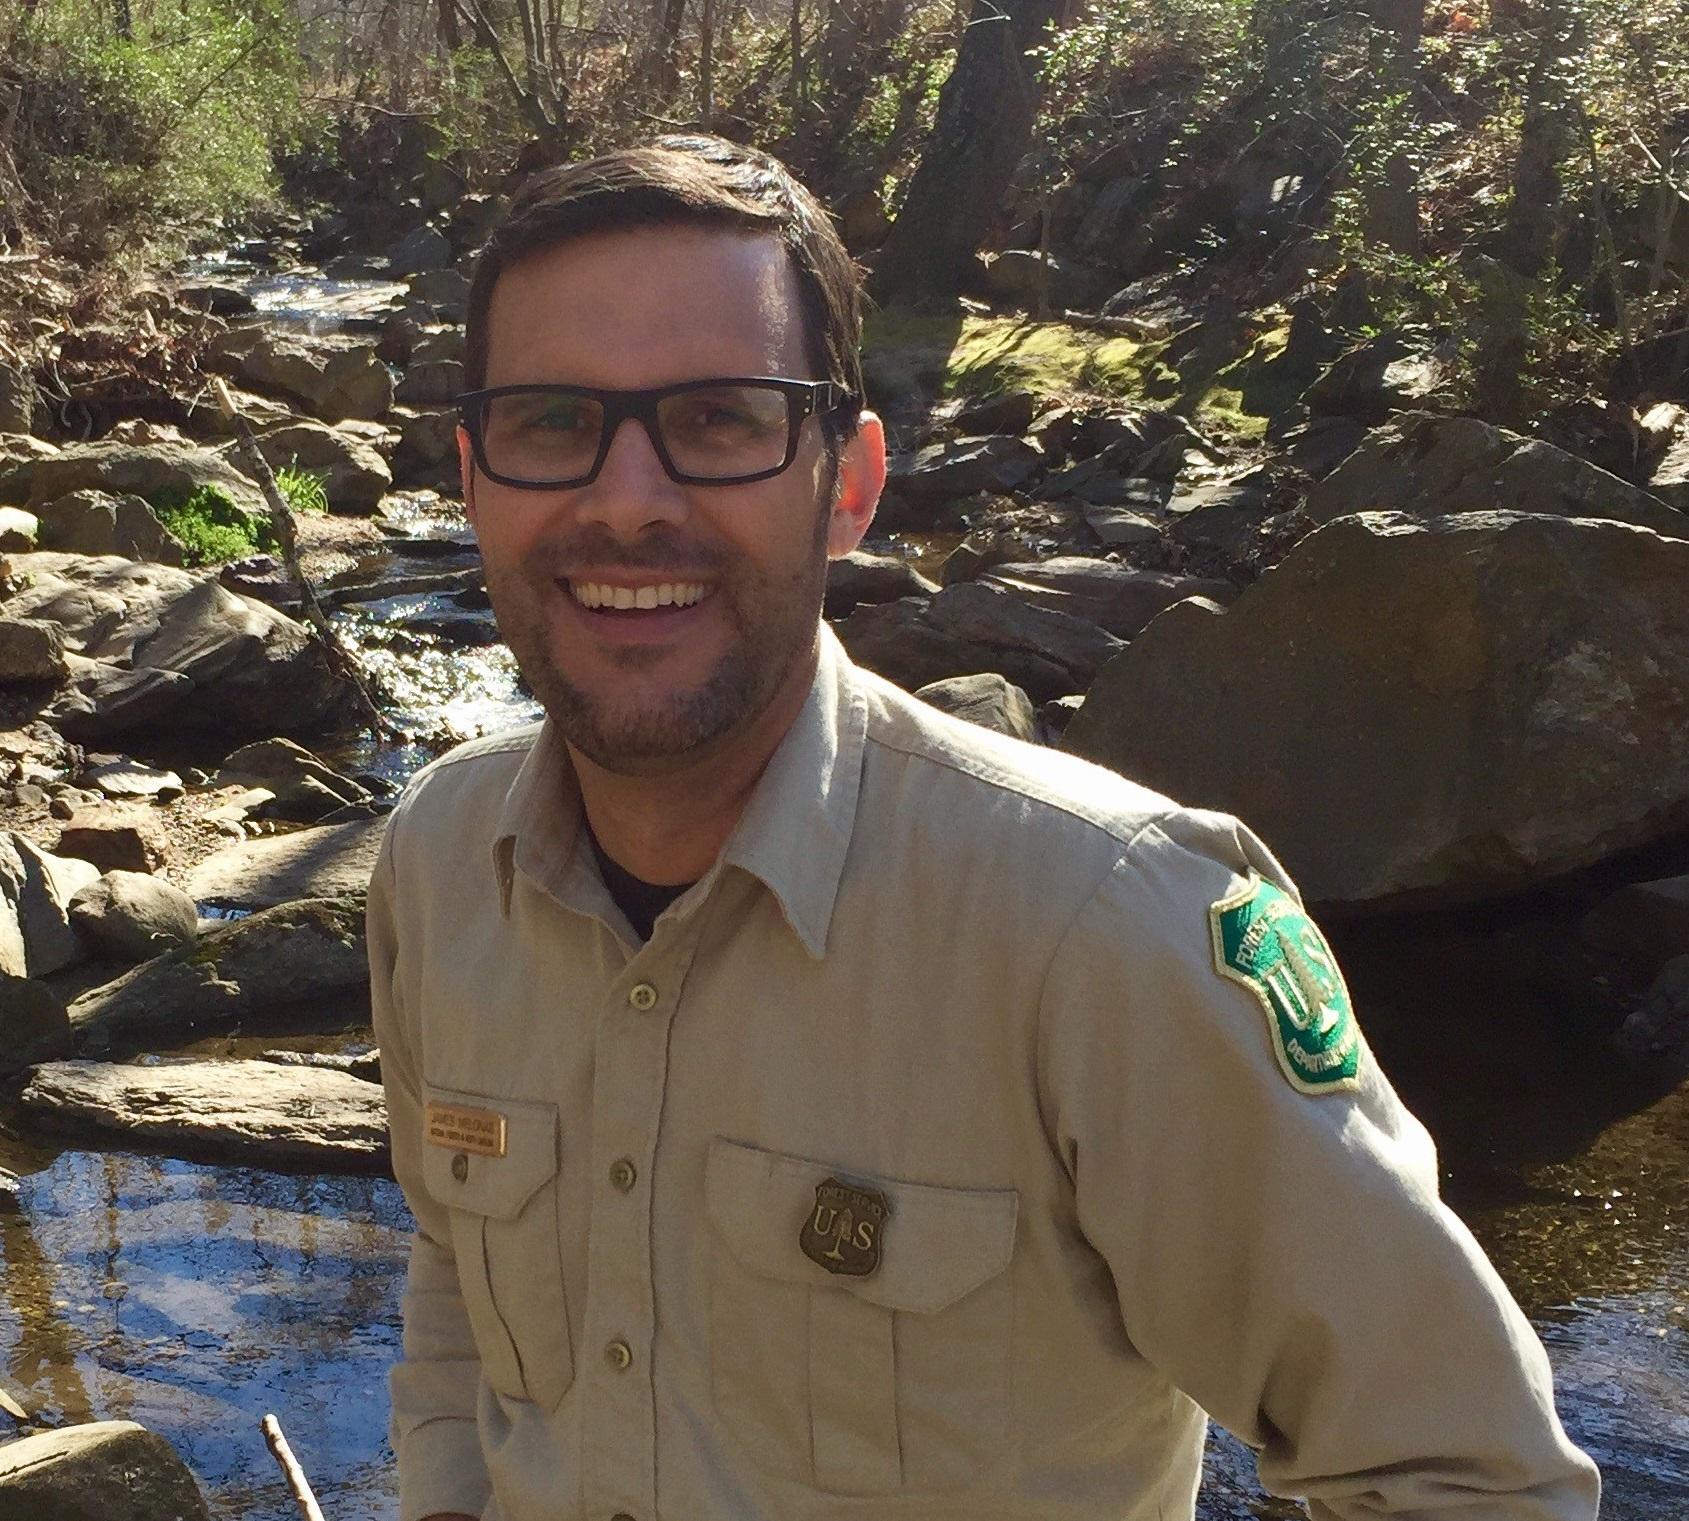 Forest supervisor balances population, budget and environmental concerns